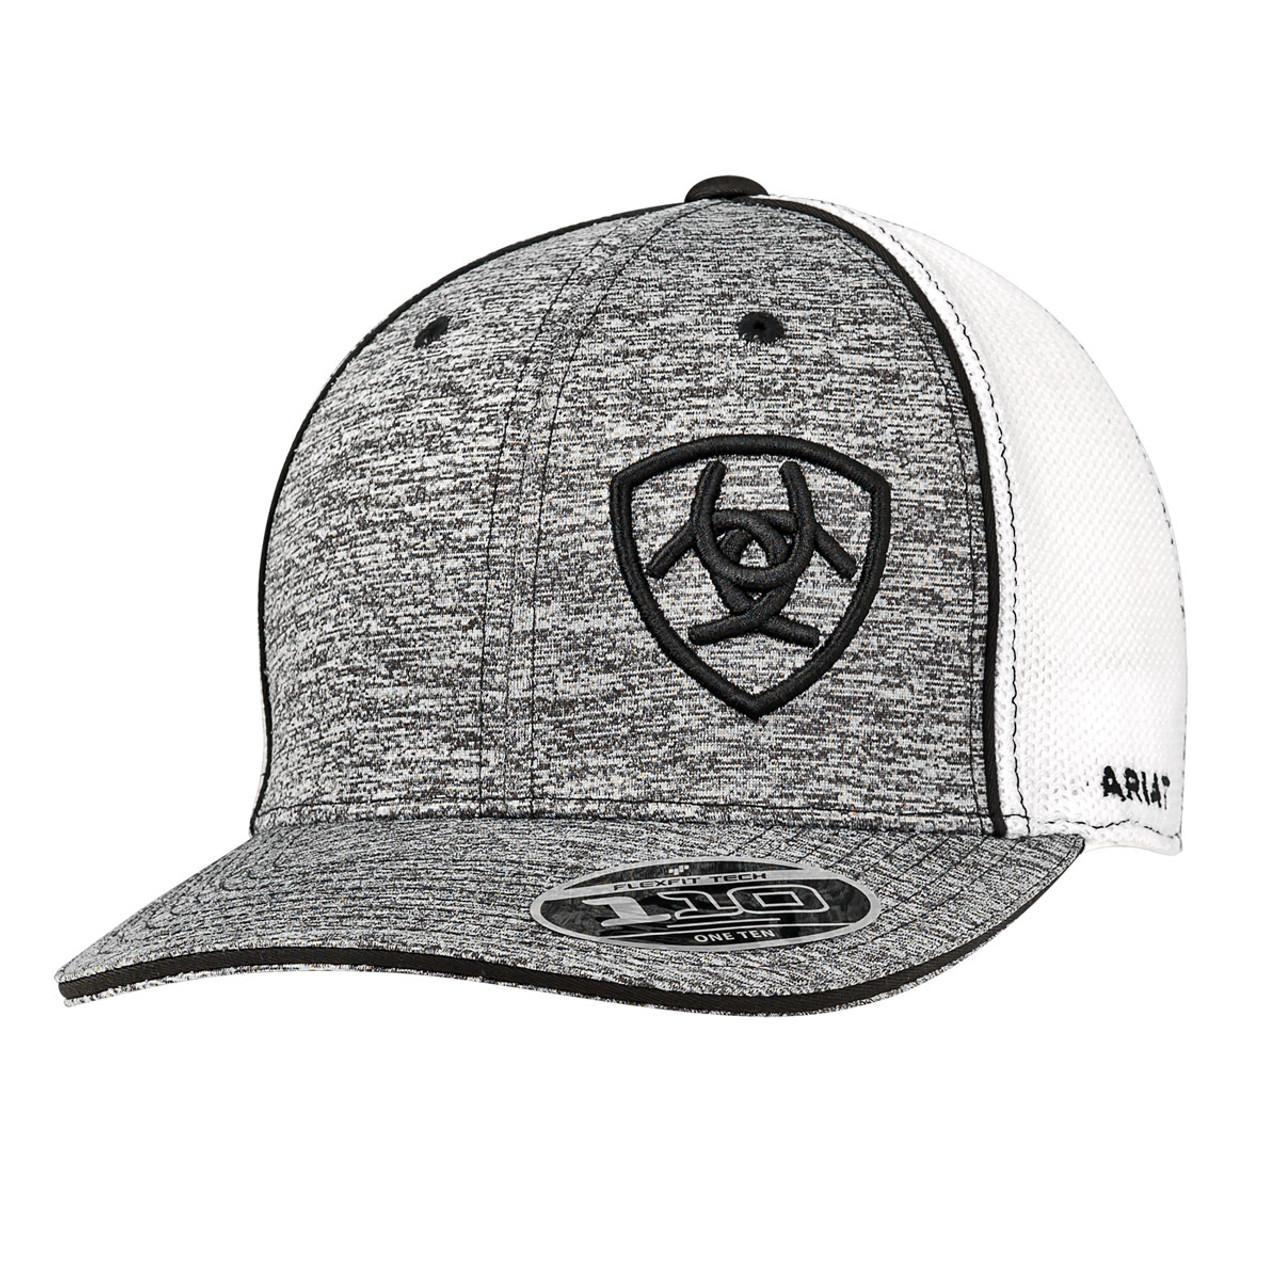 8b1750e1 Ariat Caps - White Mesh Snapback - Heather Gray w/ Black Embroidered Logo